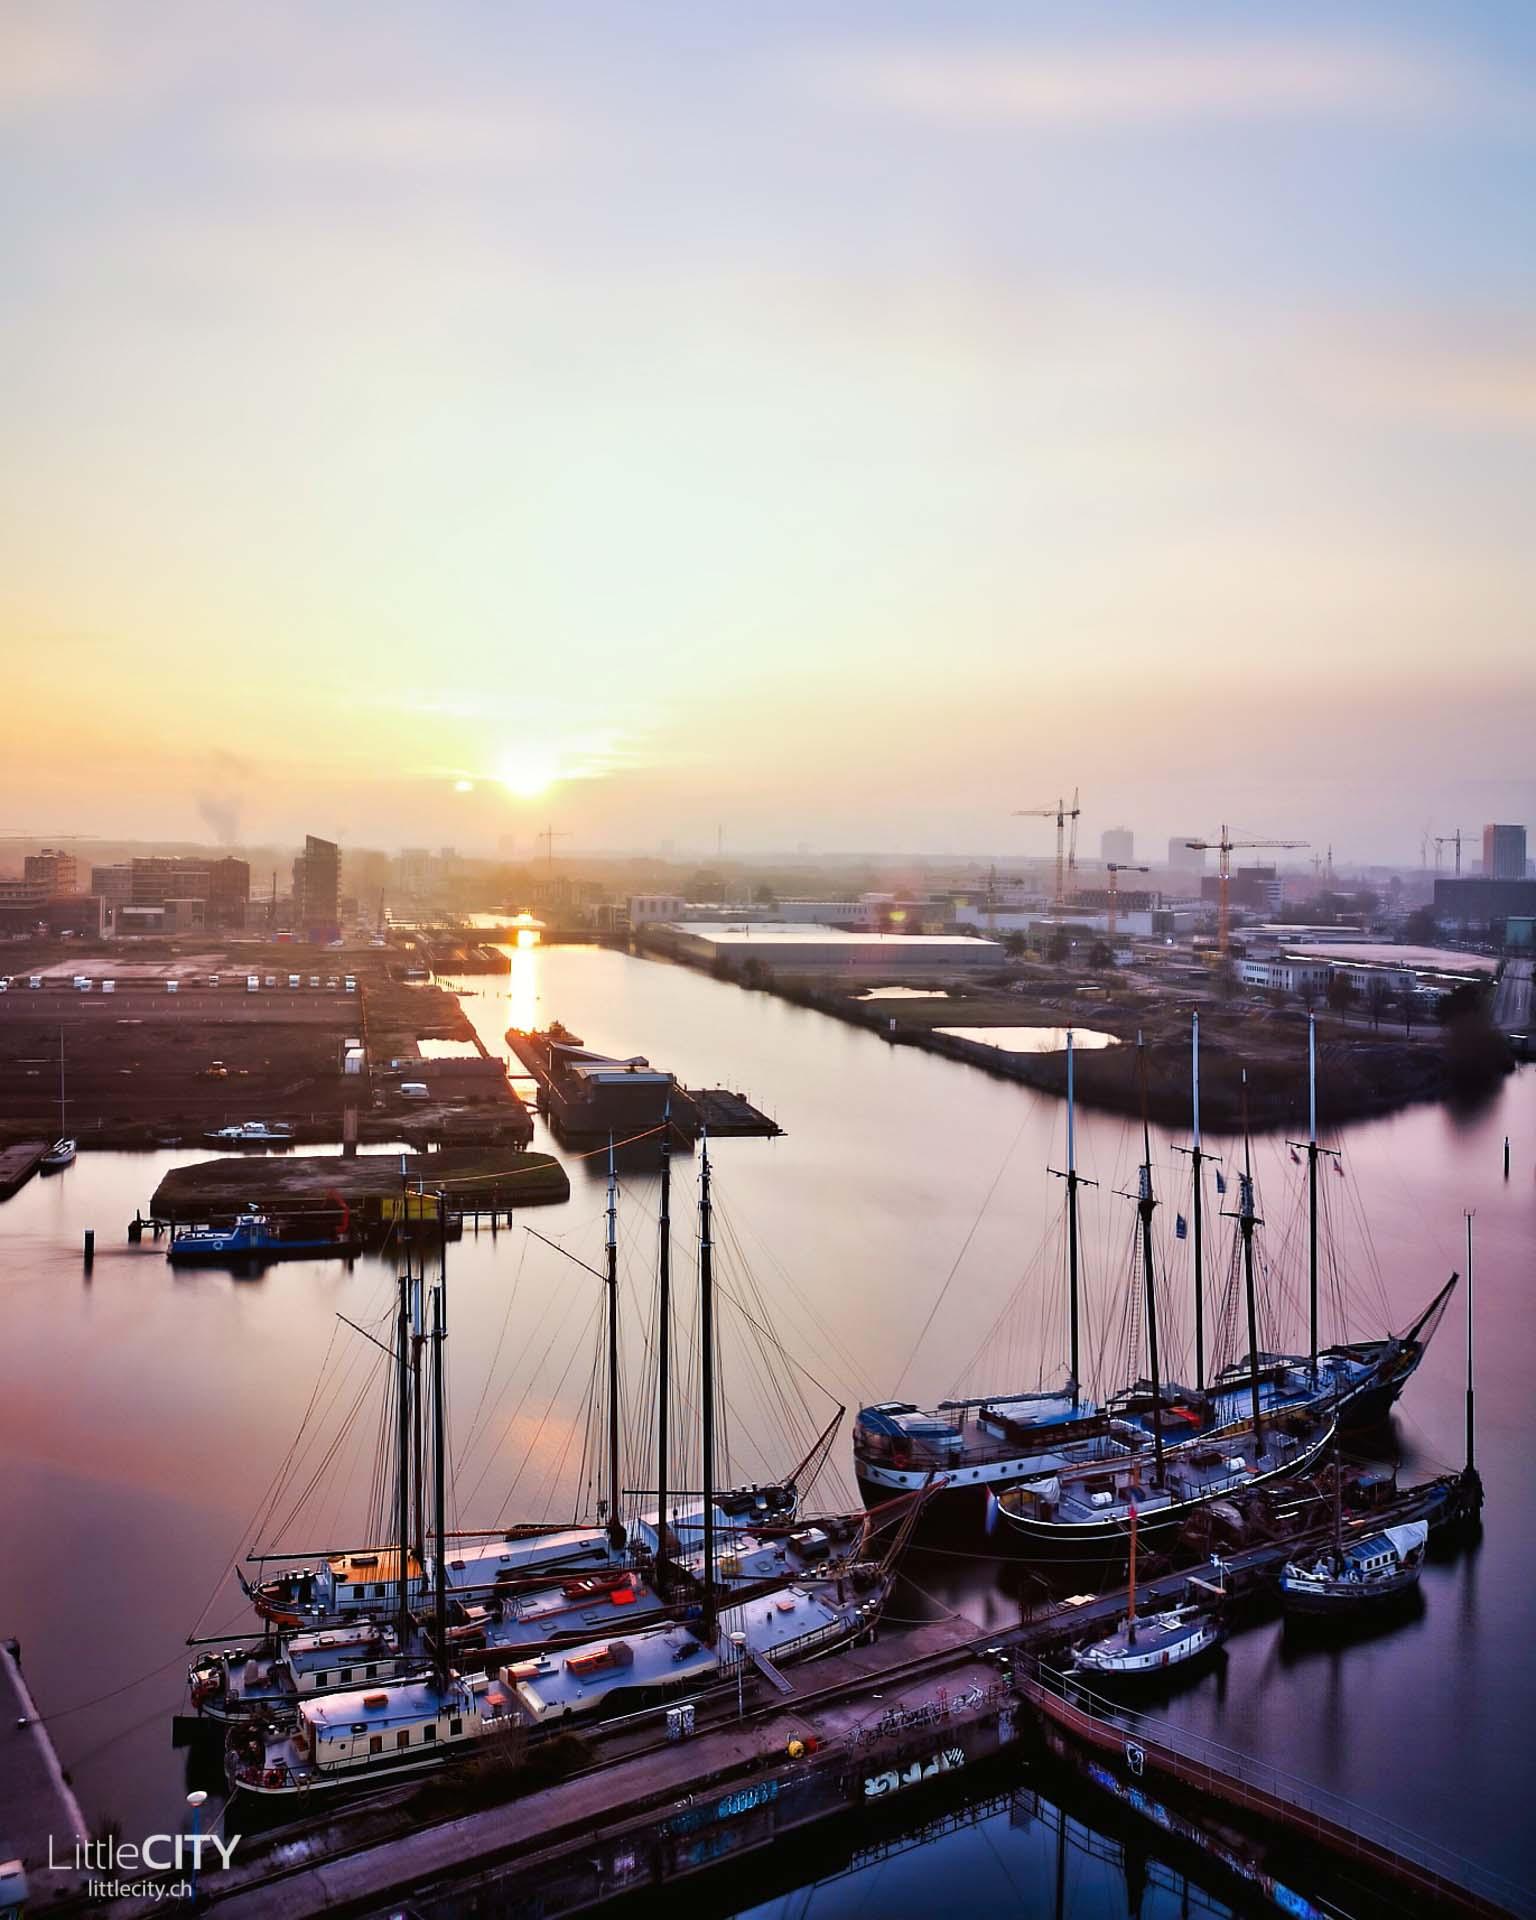 Amsterdam Ndsm Werf Sonnenaufgang